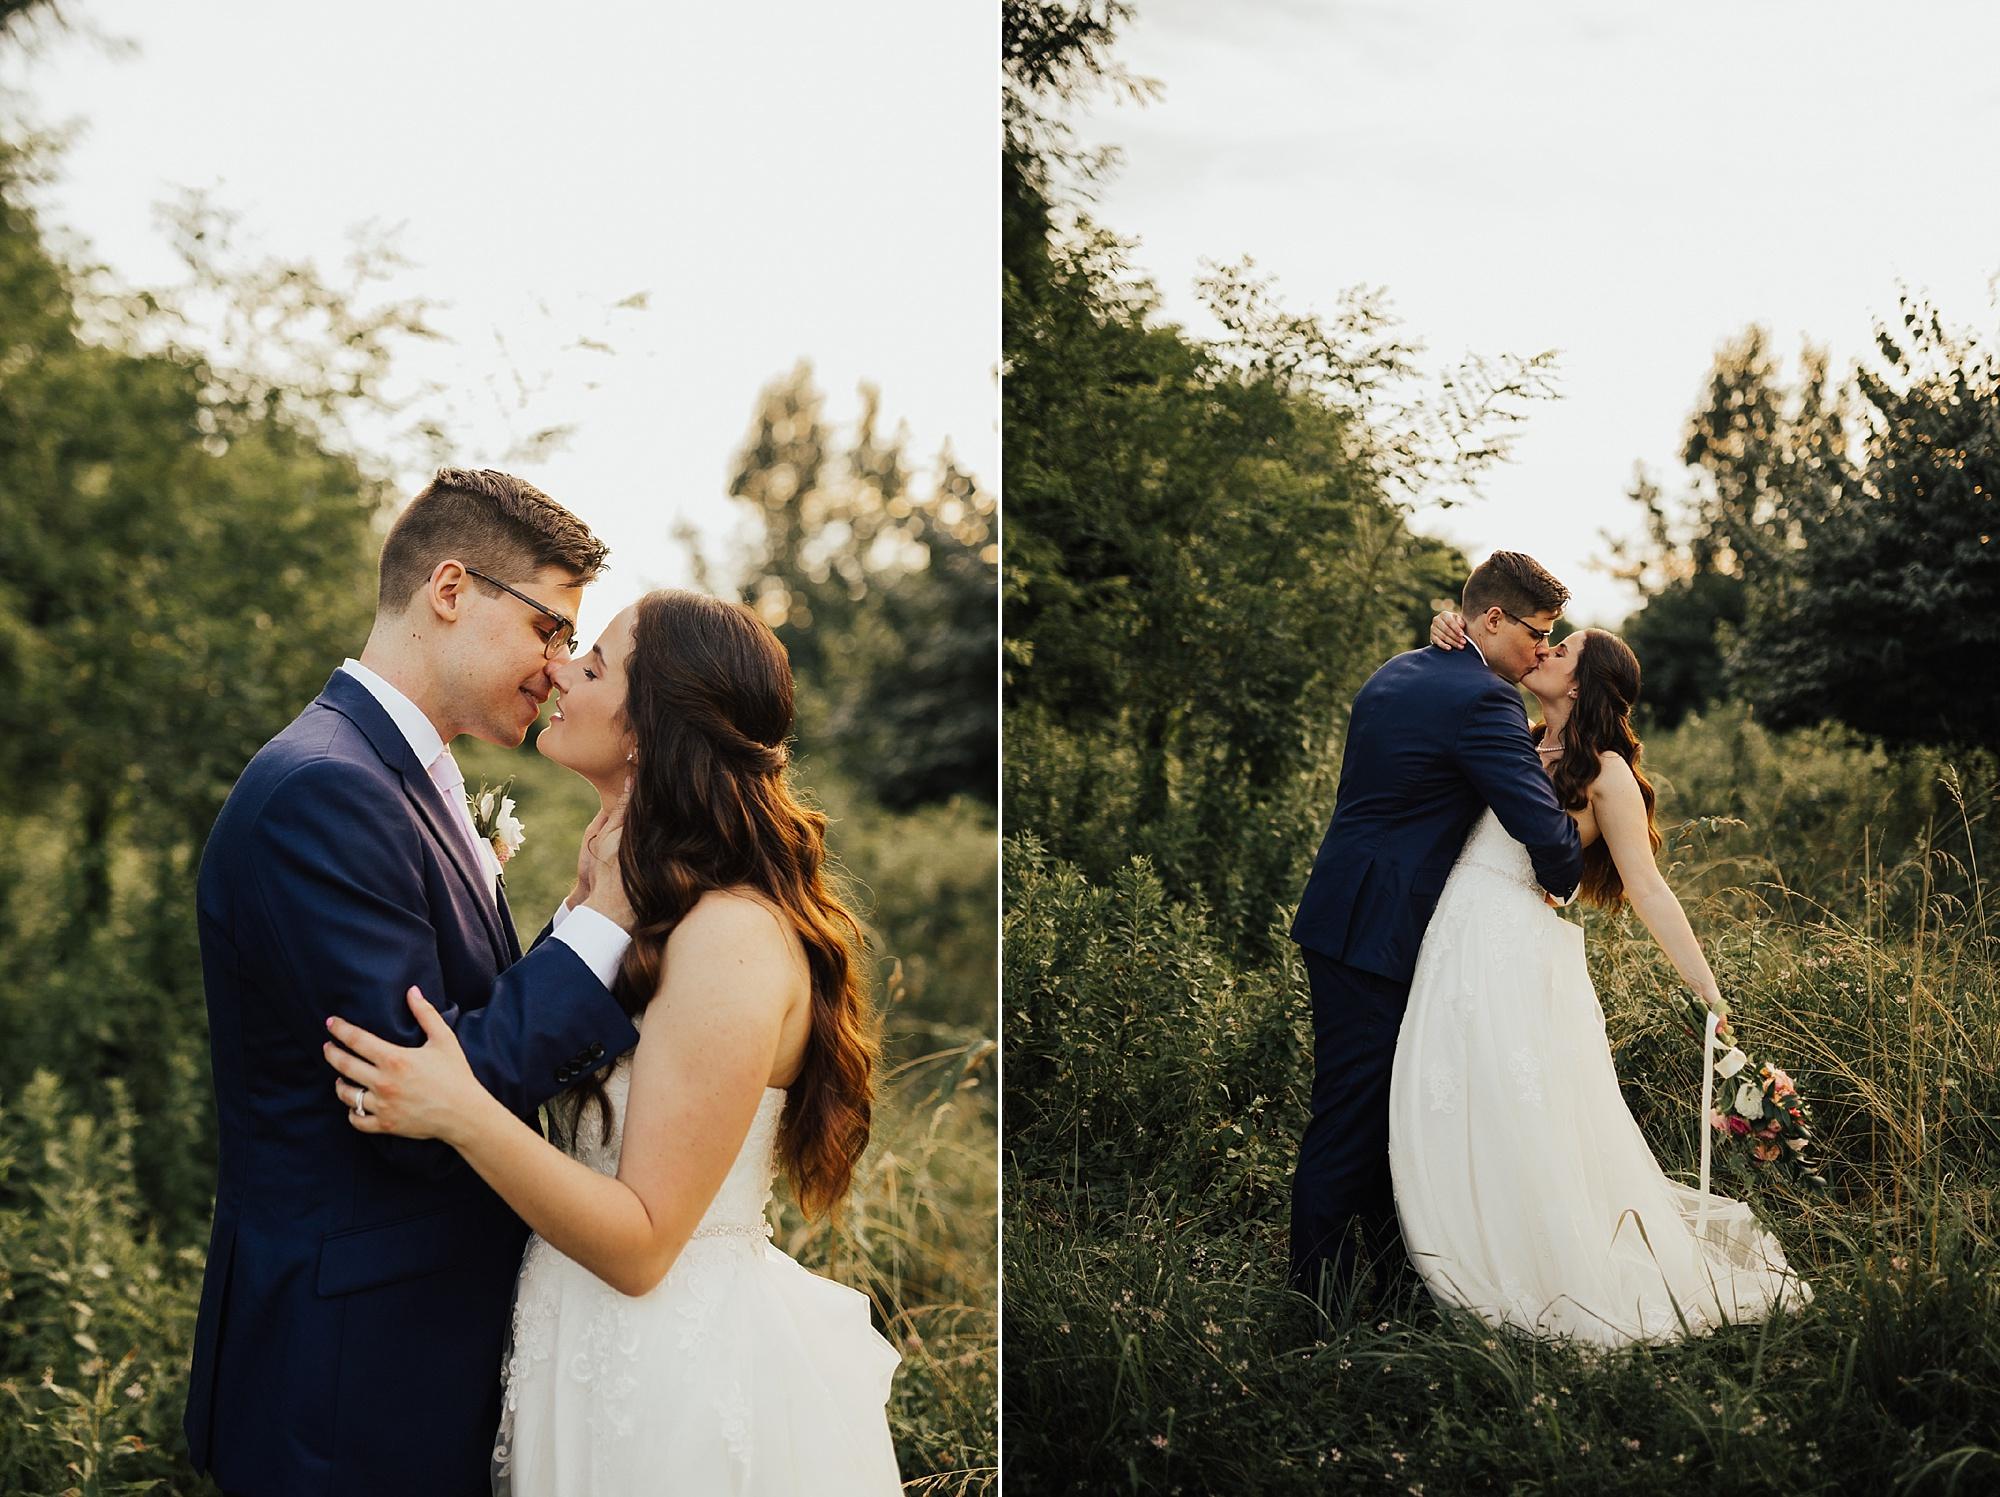 Love_by_Joe_Mac_Nicole_Patrick_Gables_At_Chadds_Ford_Wedding_Photography_Best_Philadelphia__0129.jpg